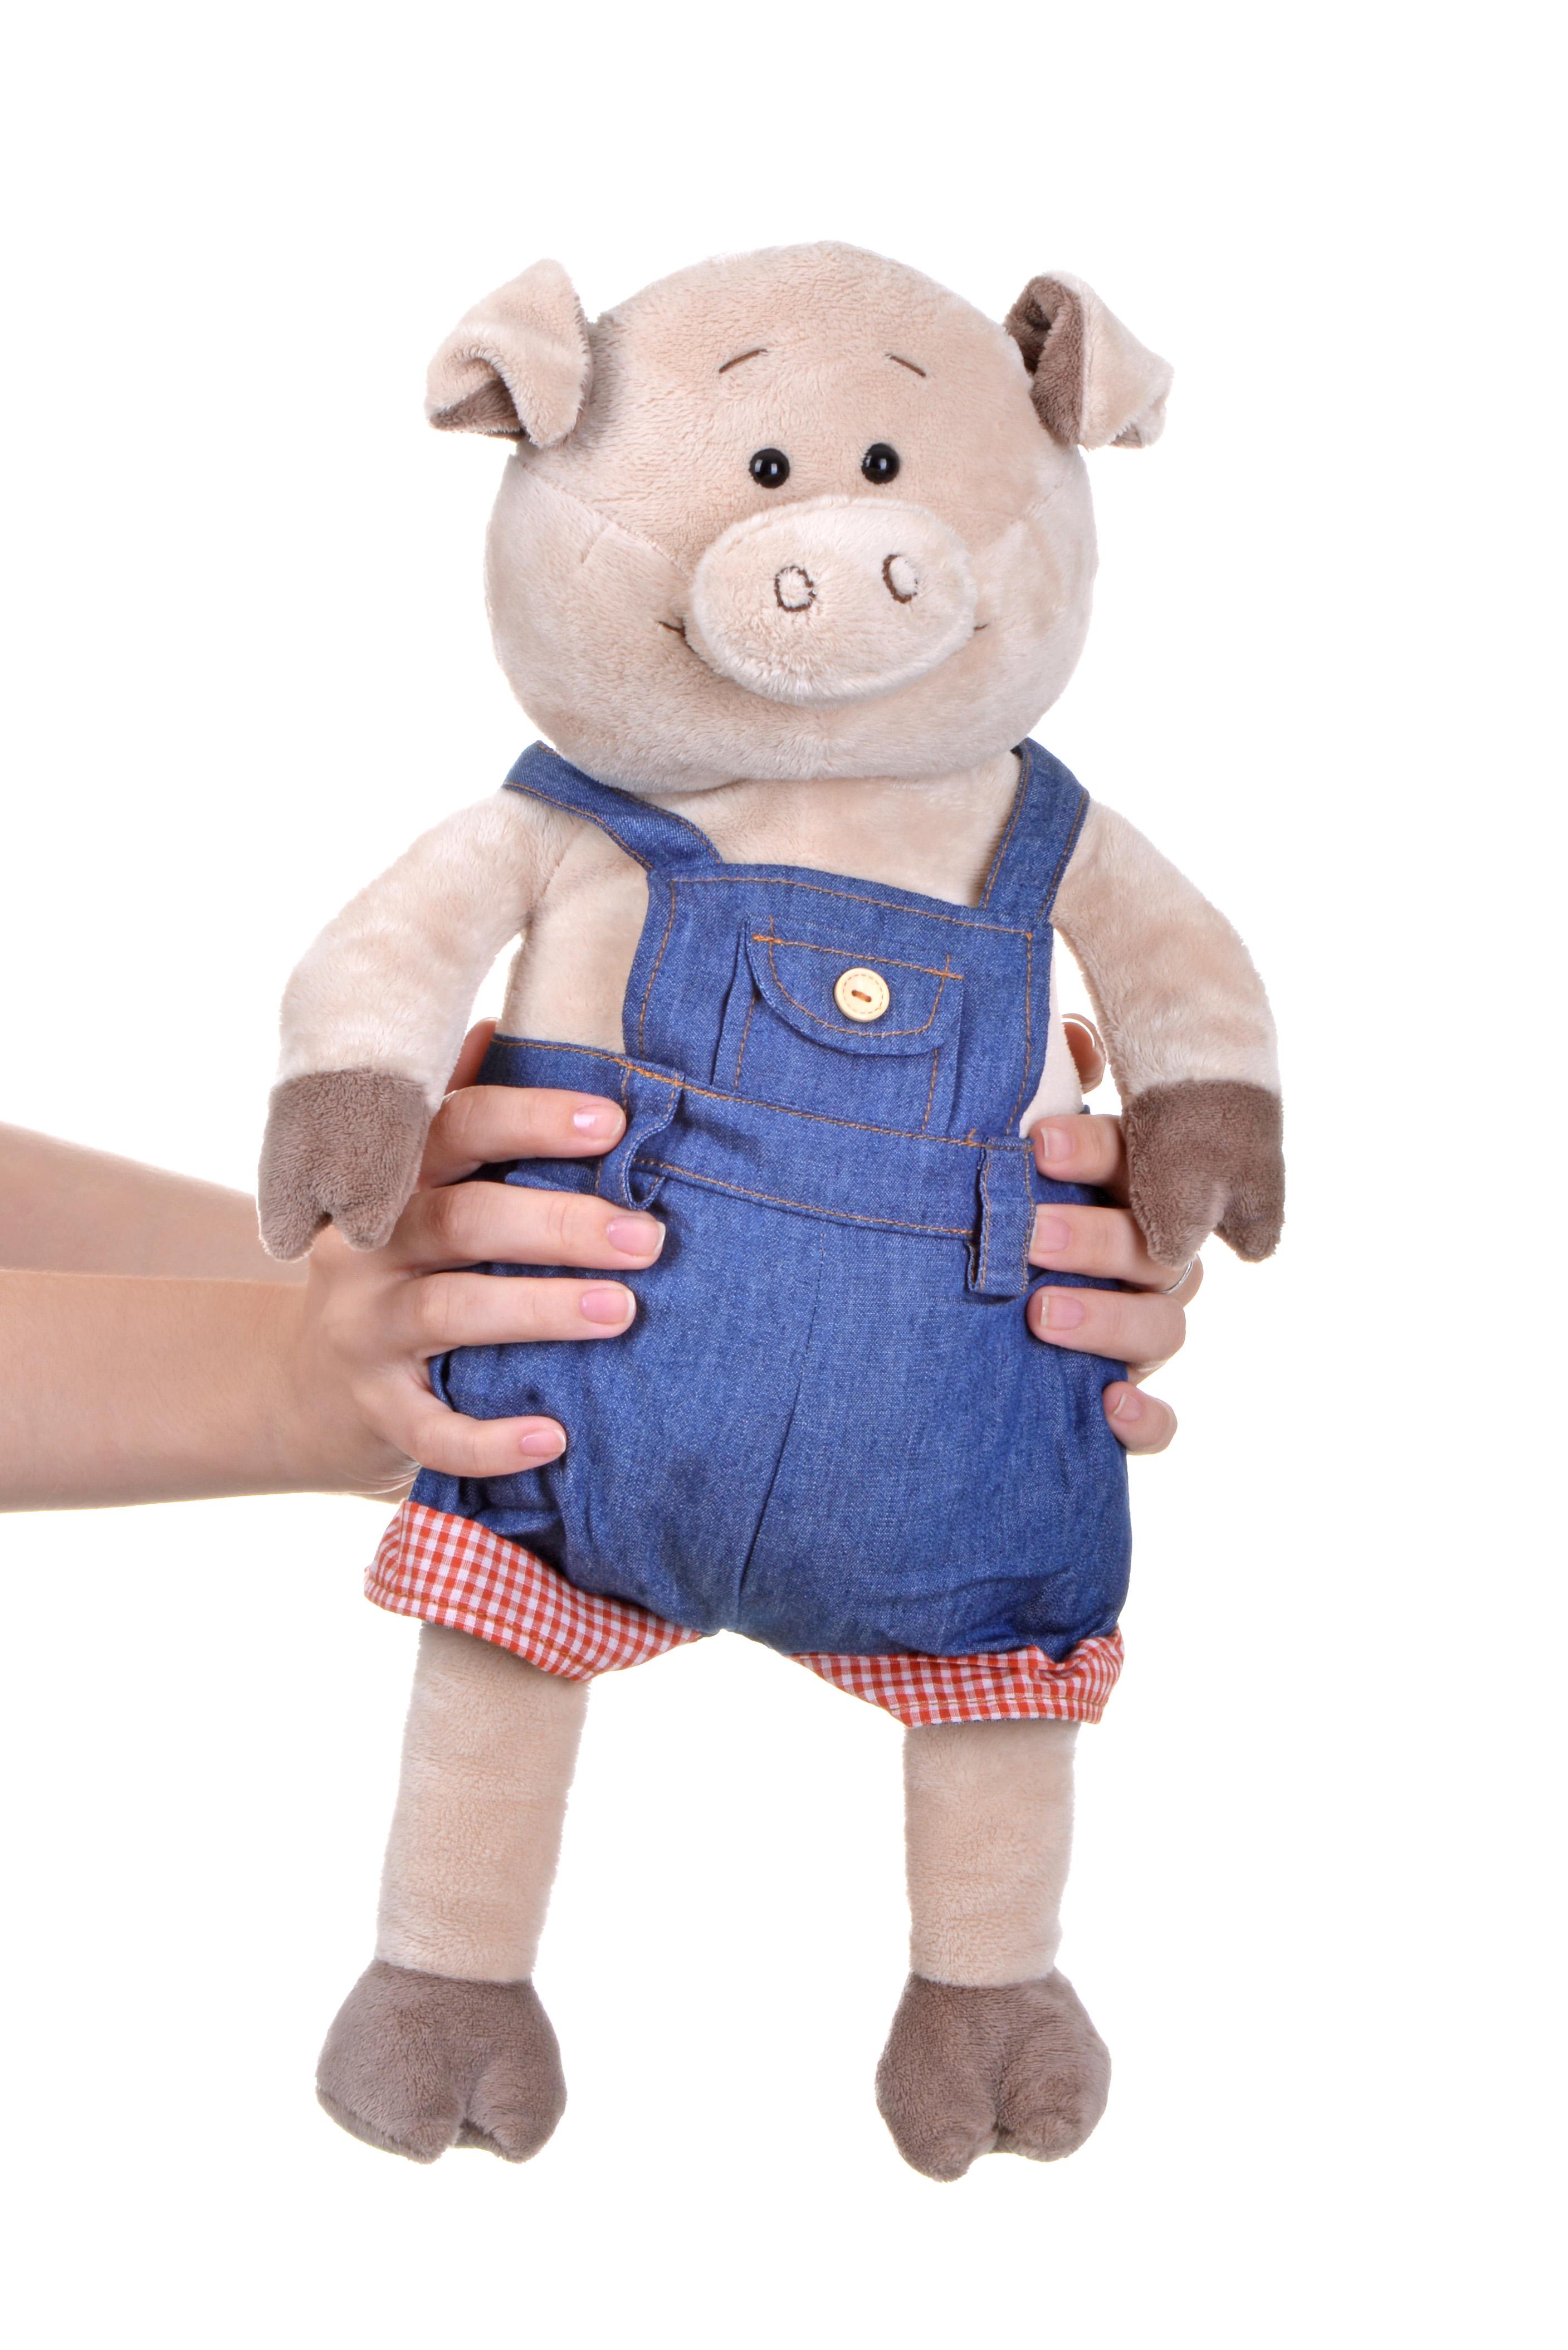 Same Toy Свинка в джинсовом комбинезоне (45 см)